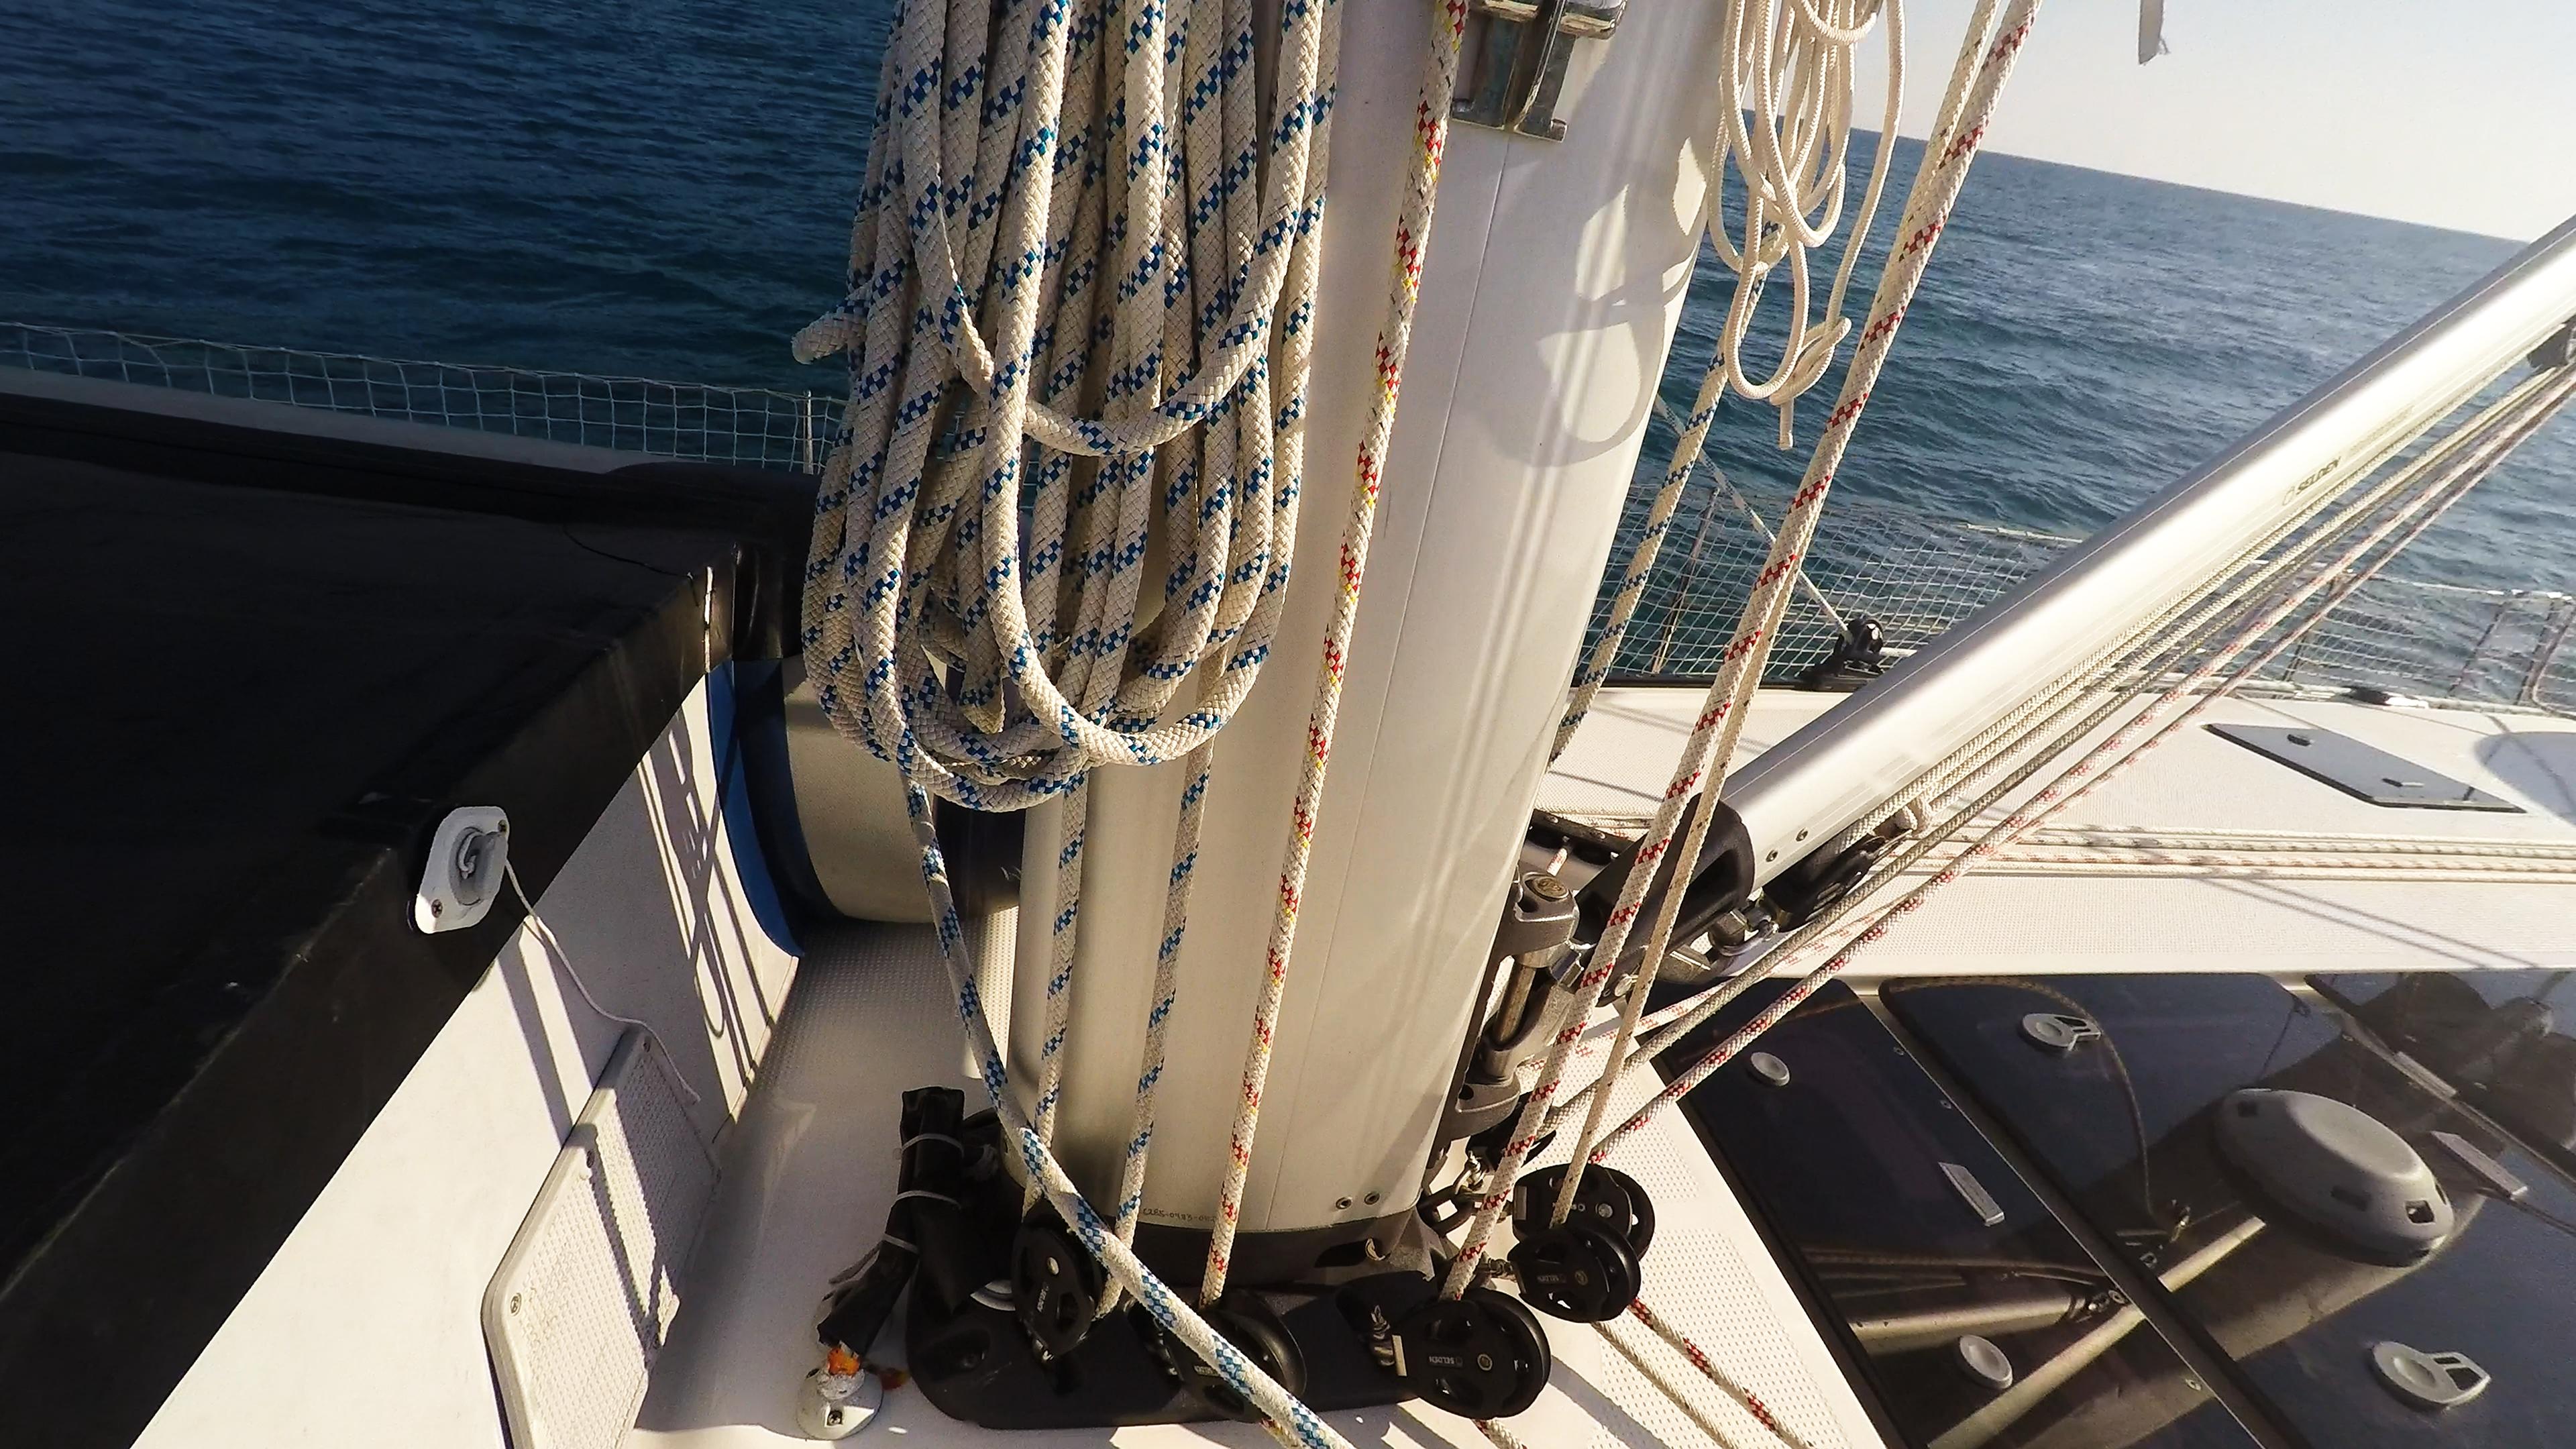 barcha a vela barca a vela fondo del albero corde vang